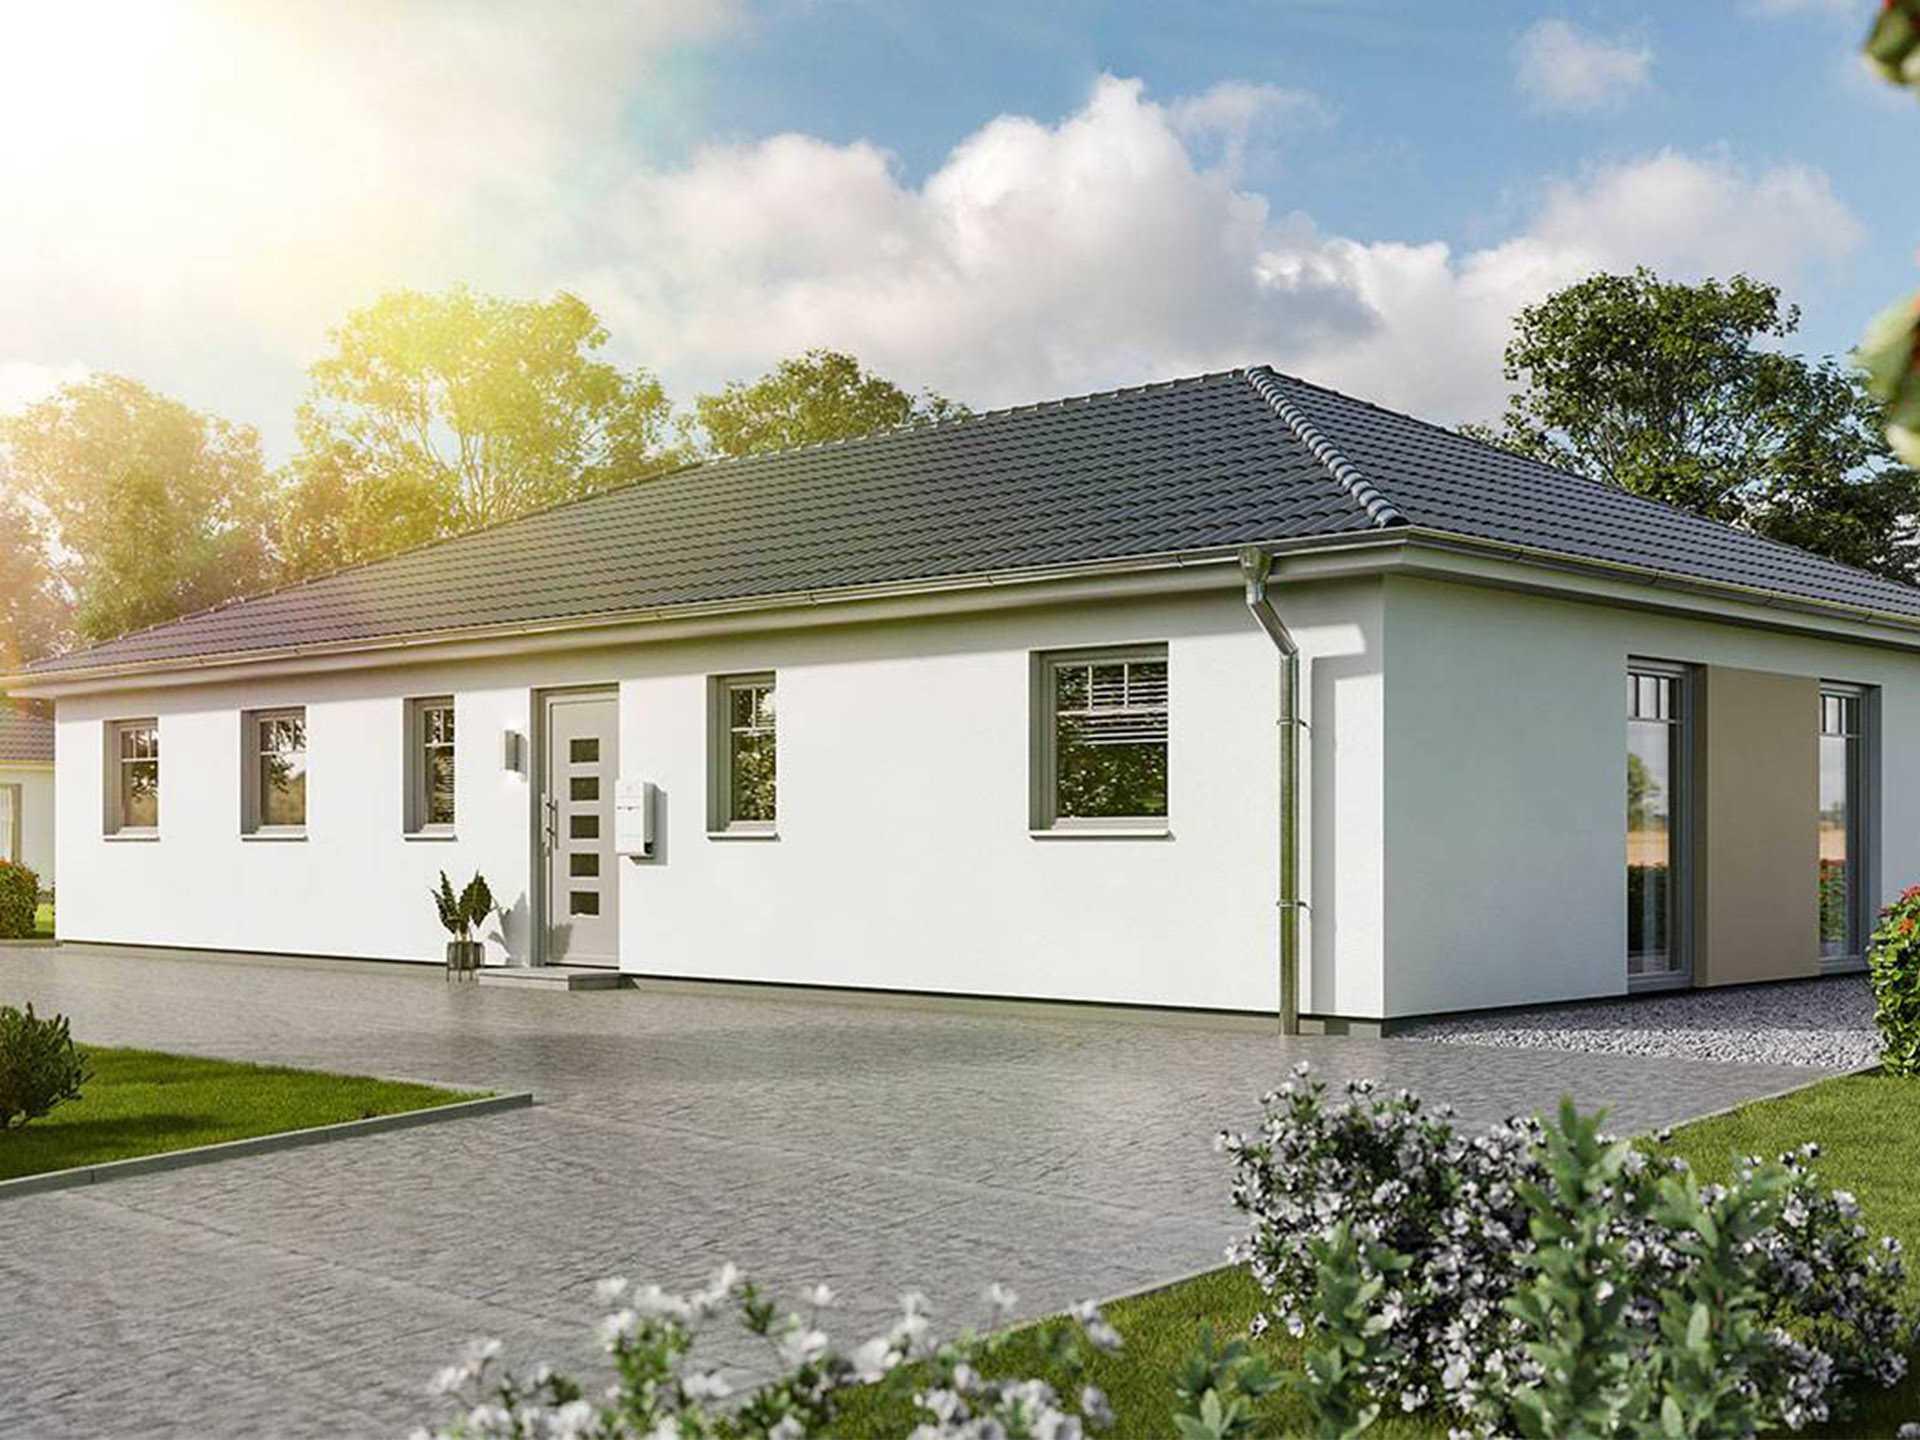 Bungalow 131 Town Country Haus Musterhausnet